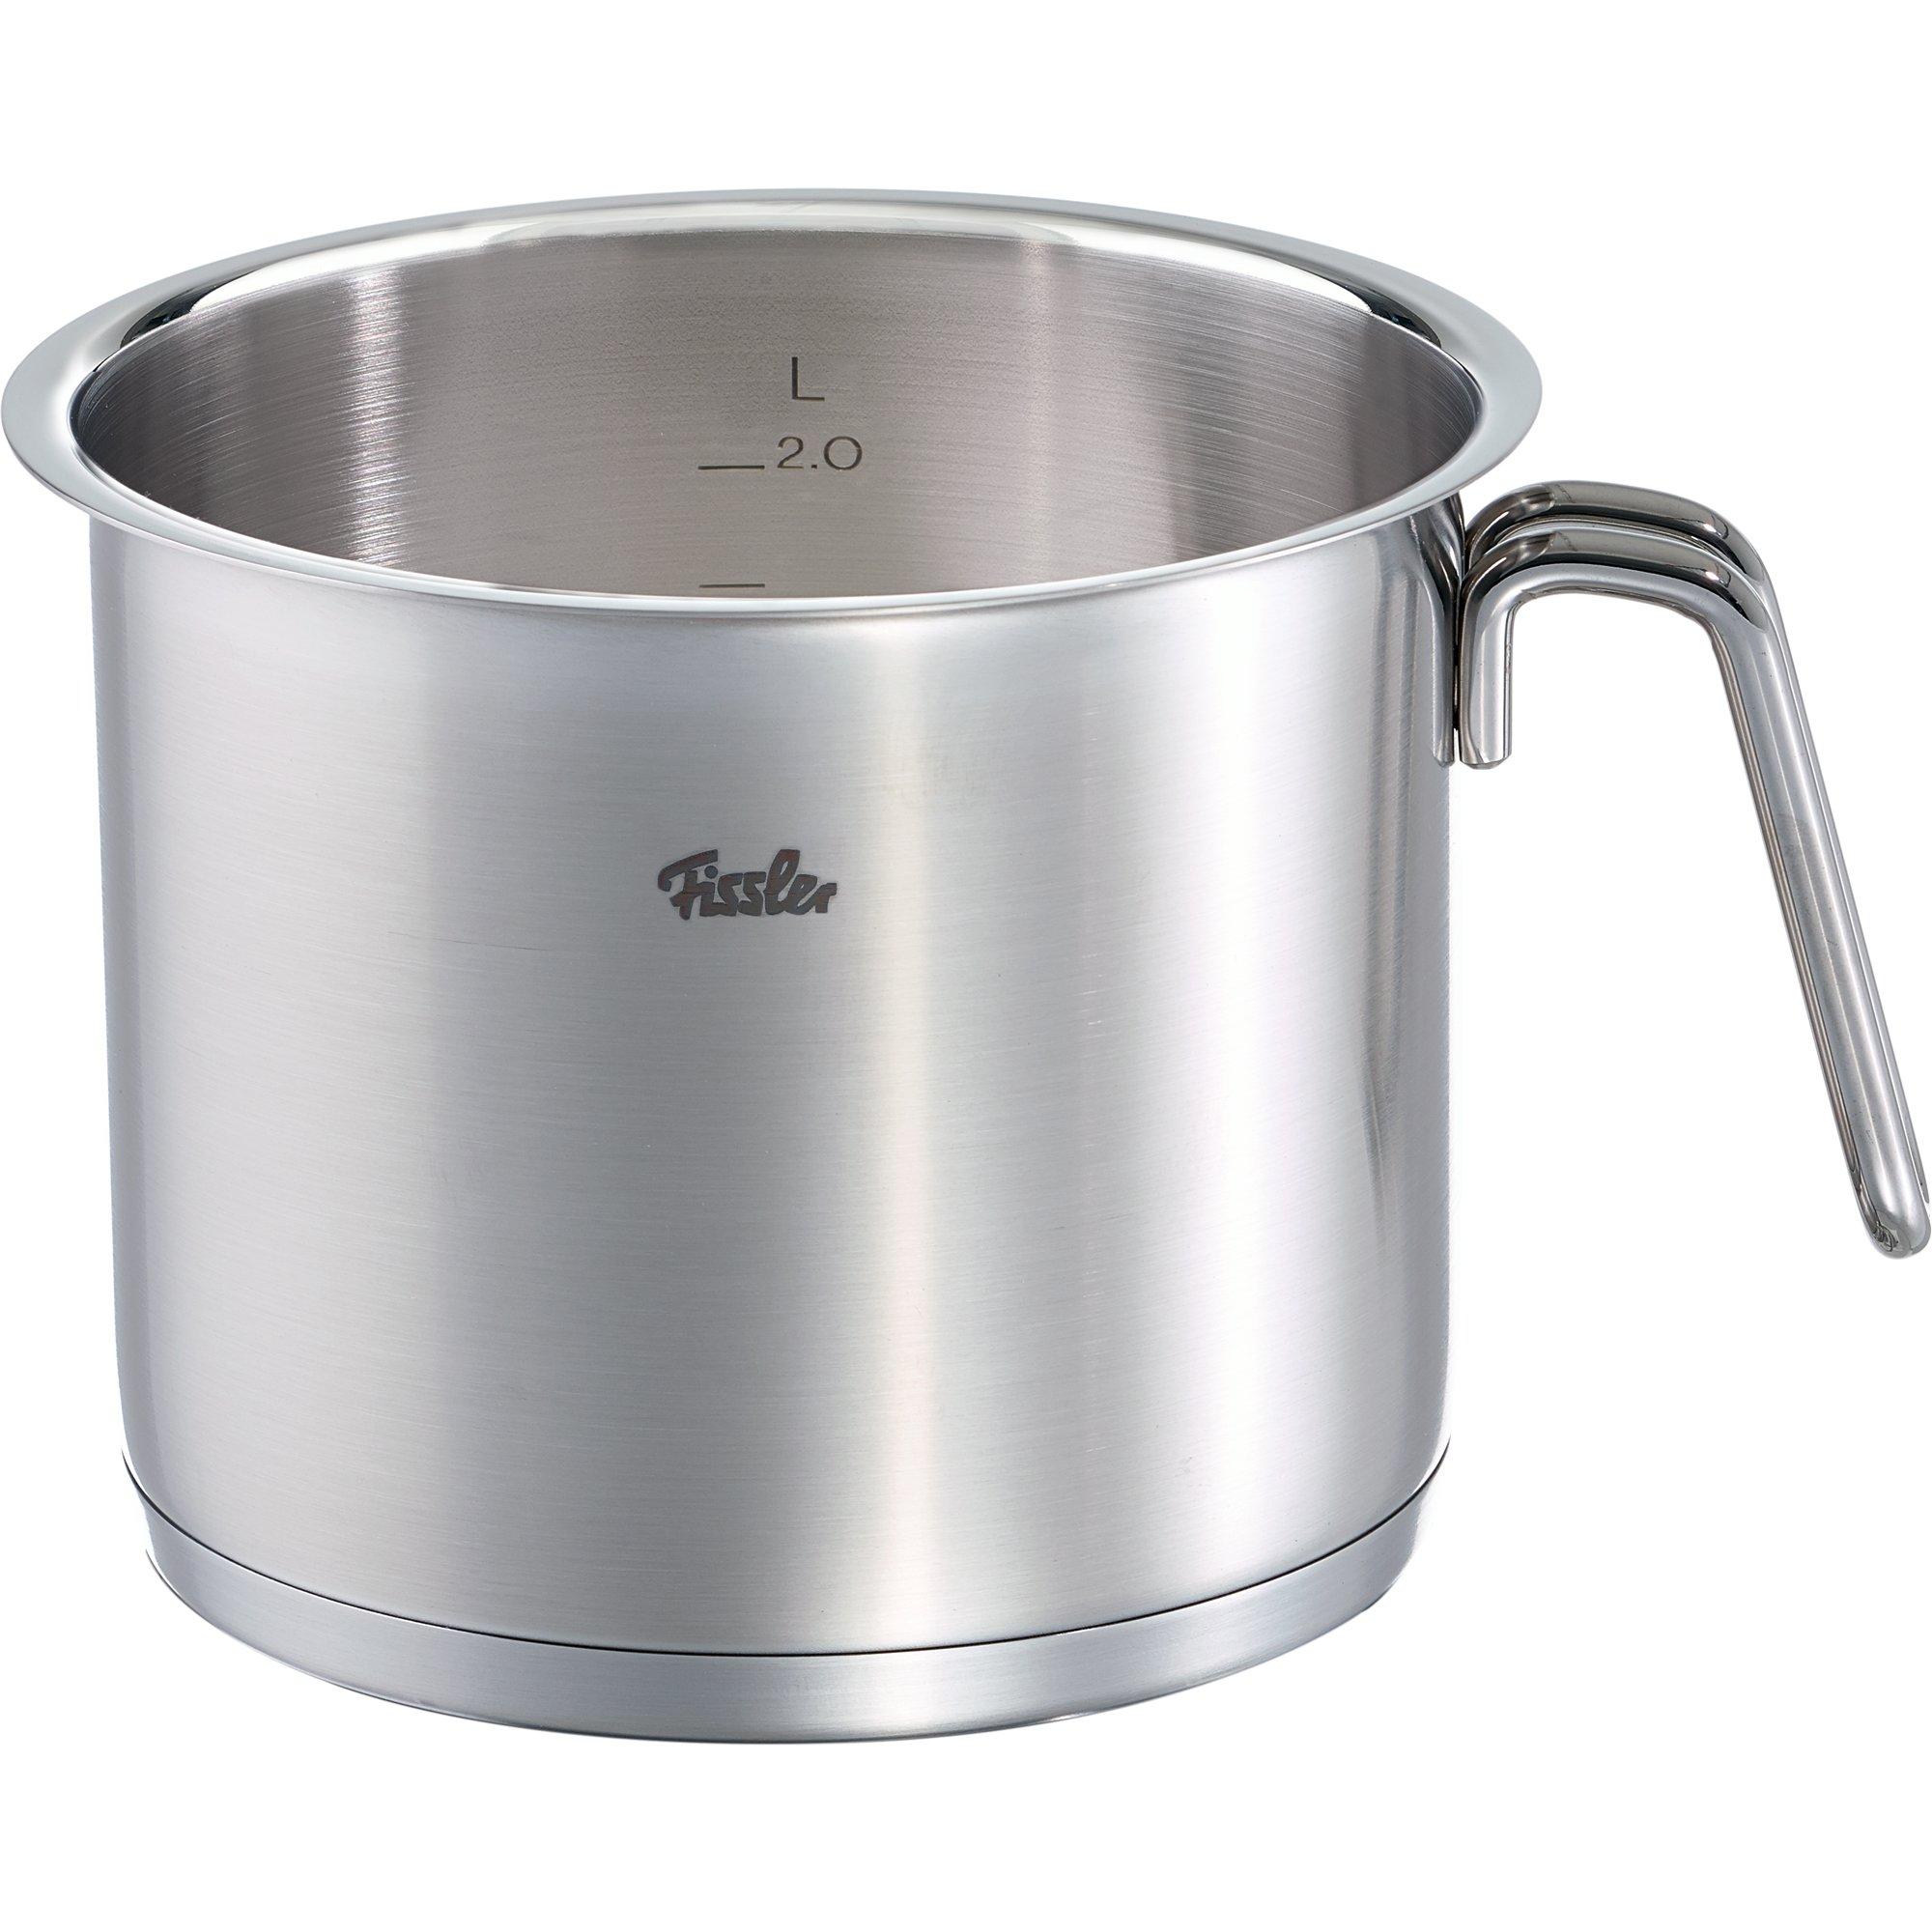 Fissler Original Pro Mjölkkastrull 26 liter